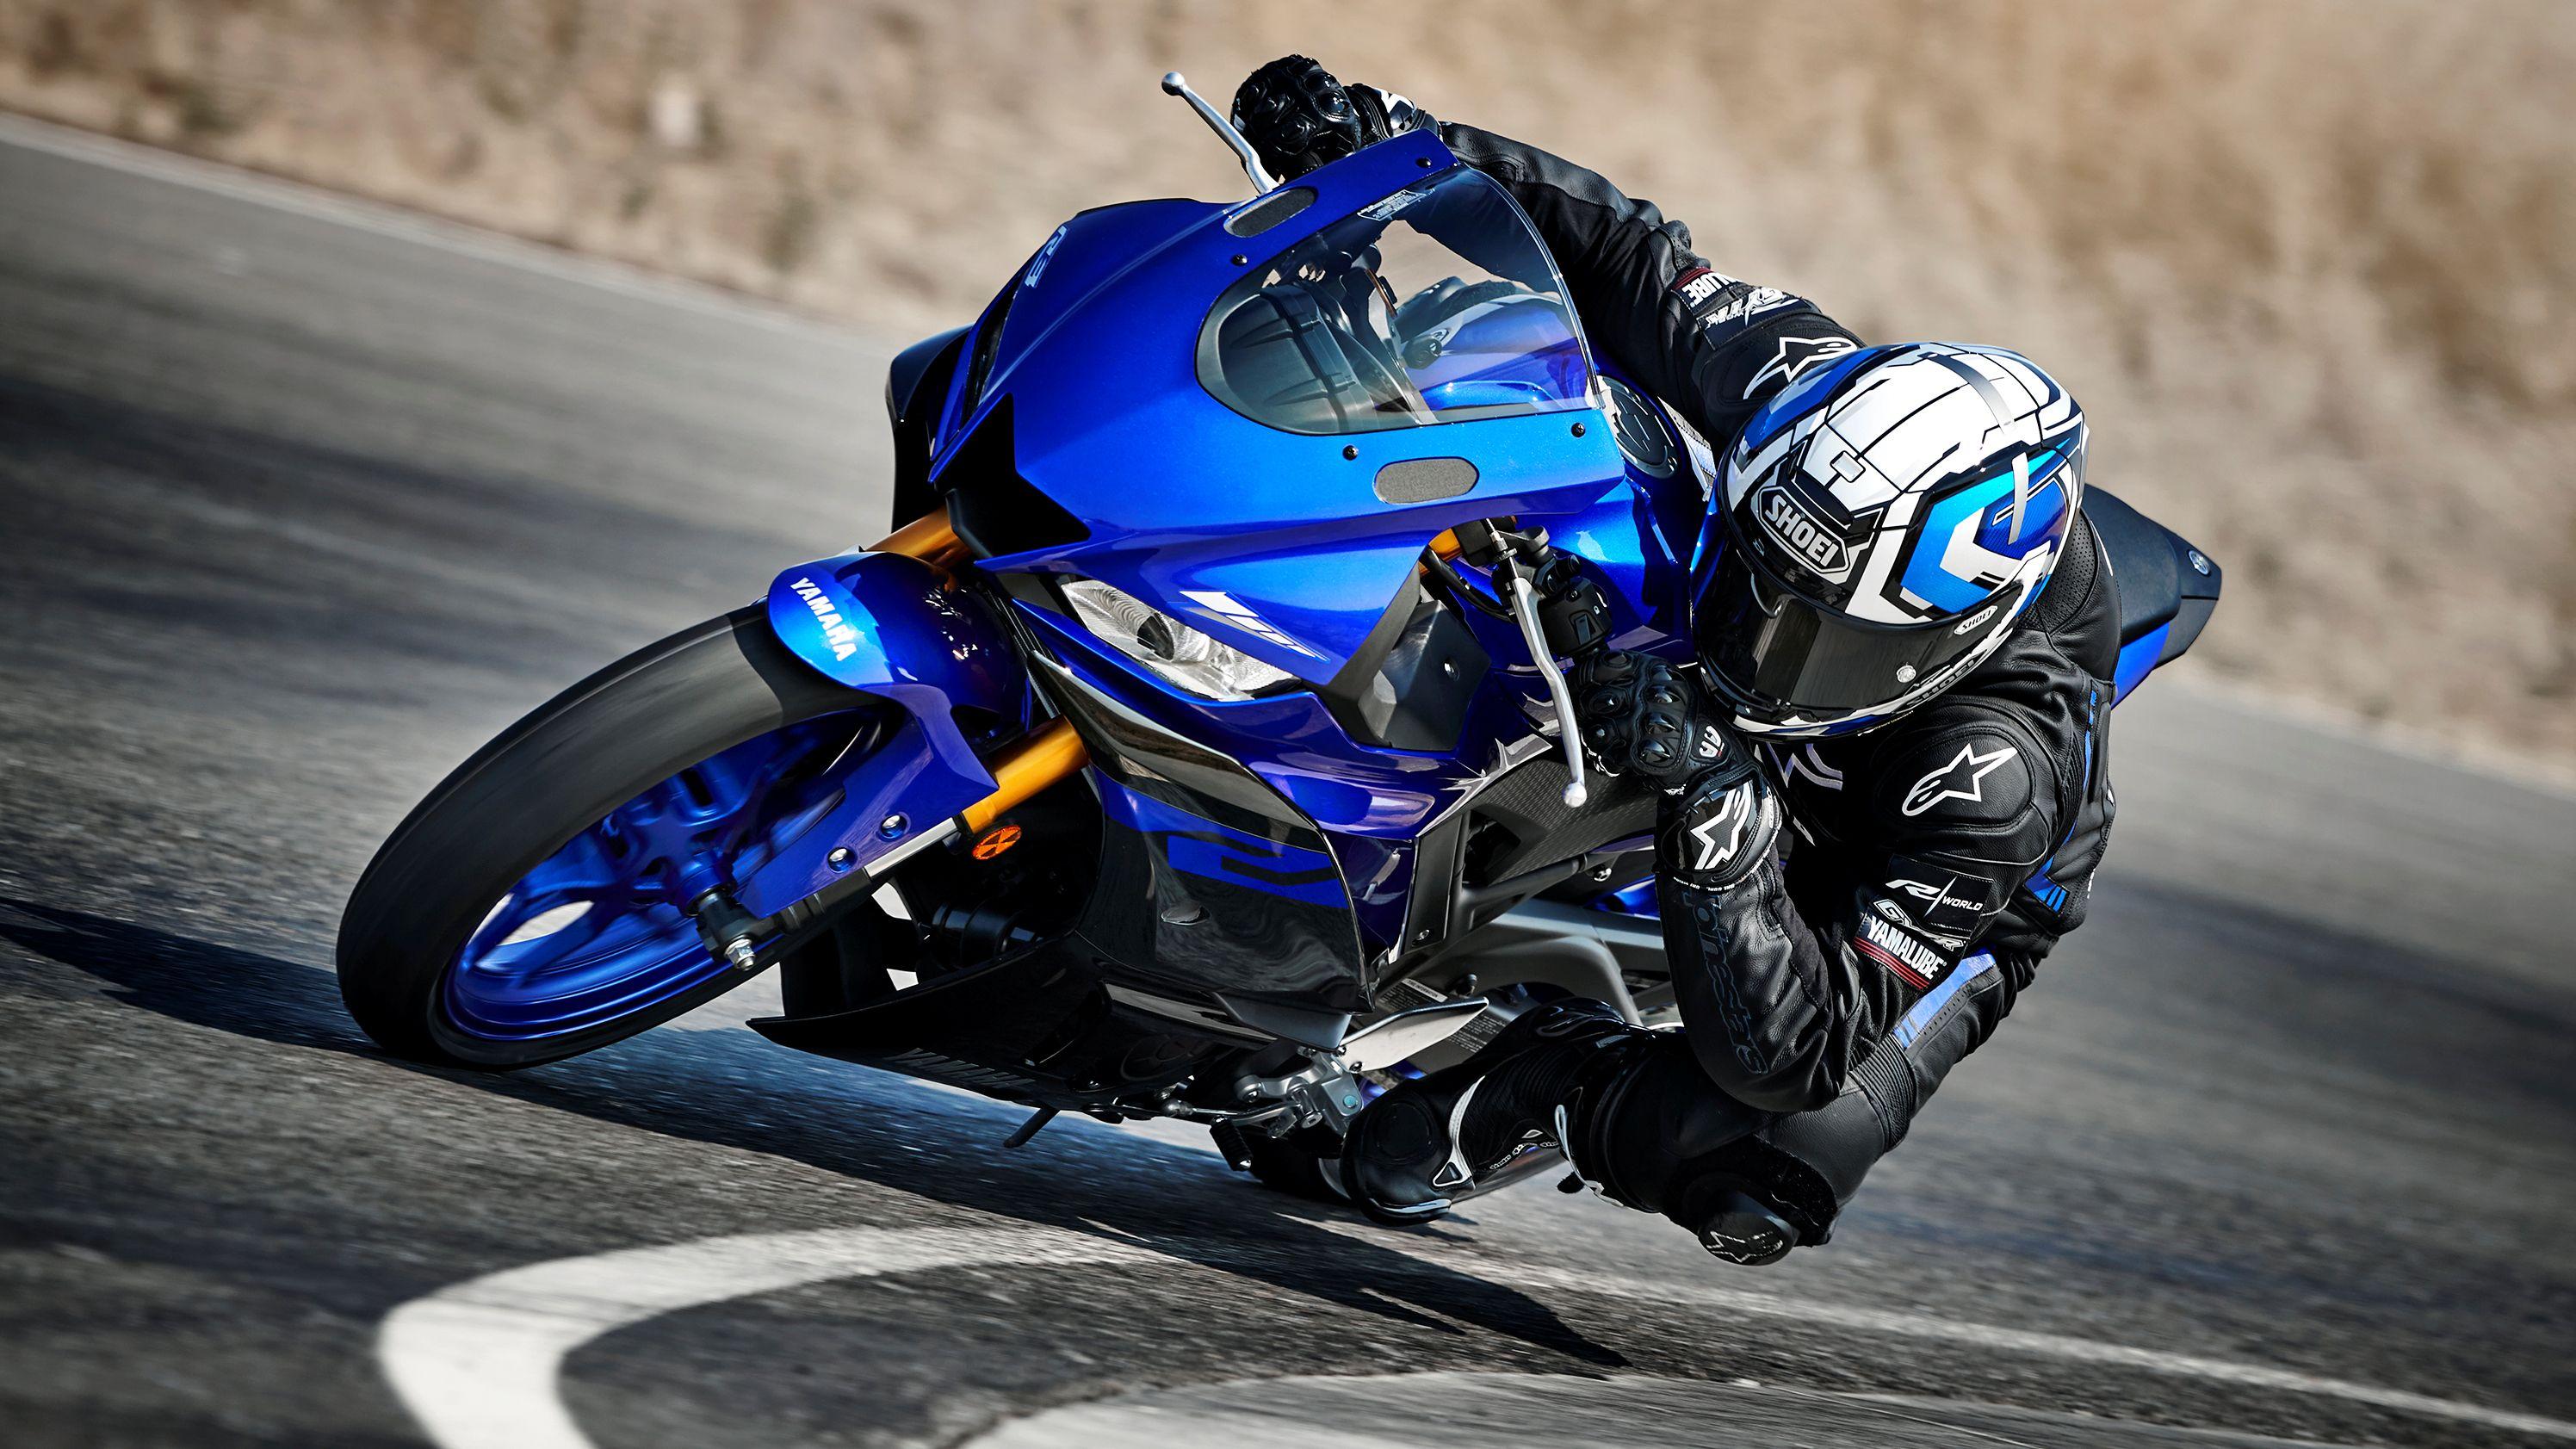 2019 2020 Yamaha Yzf R3 Yamaha Yzf Yamaha Yamaha R3